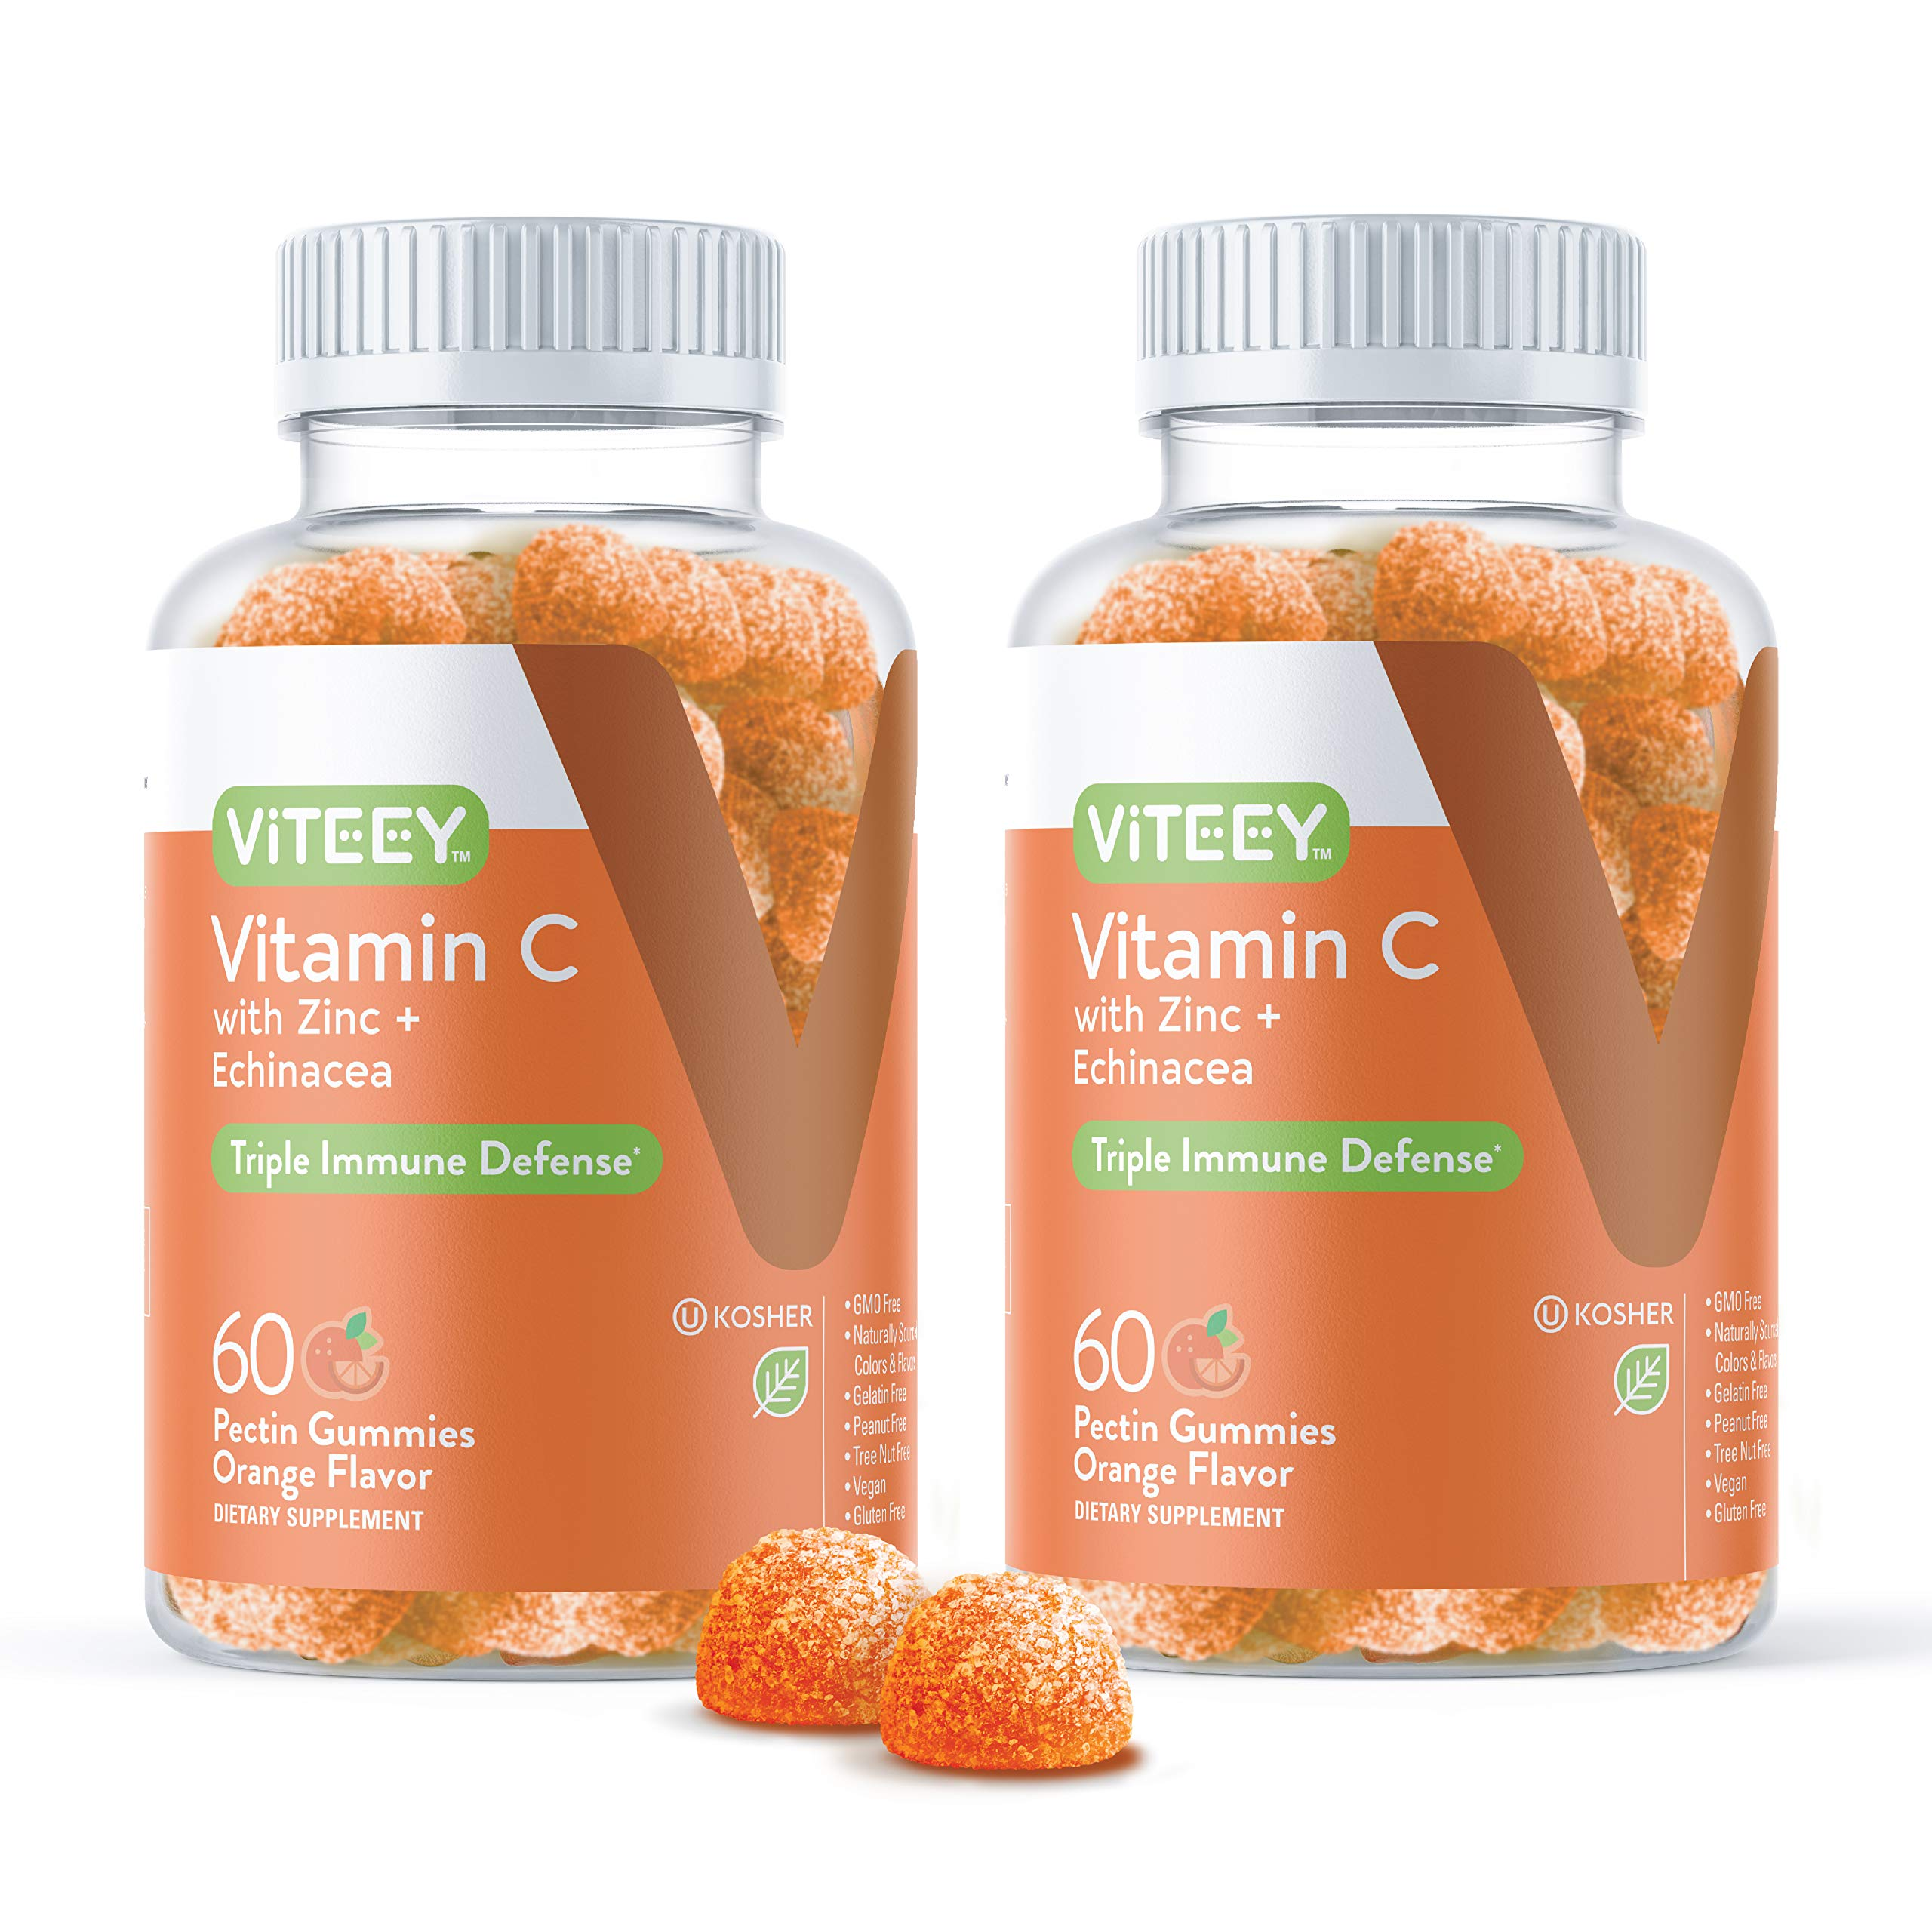 Vitamin C Gummies Plus Zinc & Echinacea [3 in 1 Immune Support Booster] Herbal Dietary Supplements, Vegan, Plant Based Pectin - Good for Adults Teens & Kids - Orange Flavor Gummy [60 Count 2-Pack]